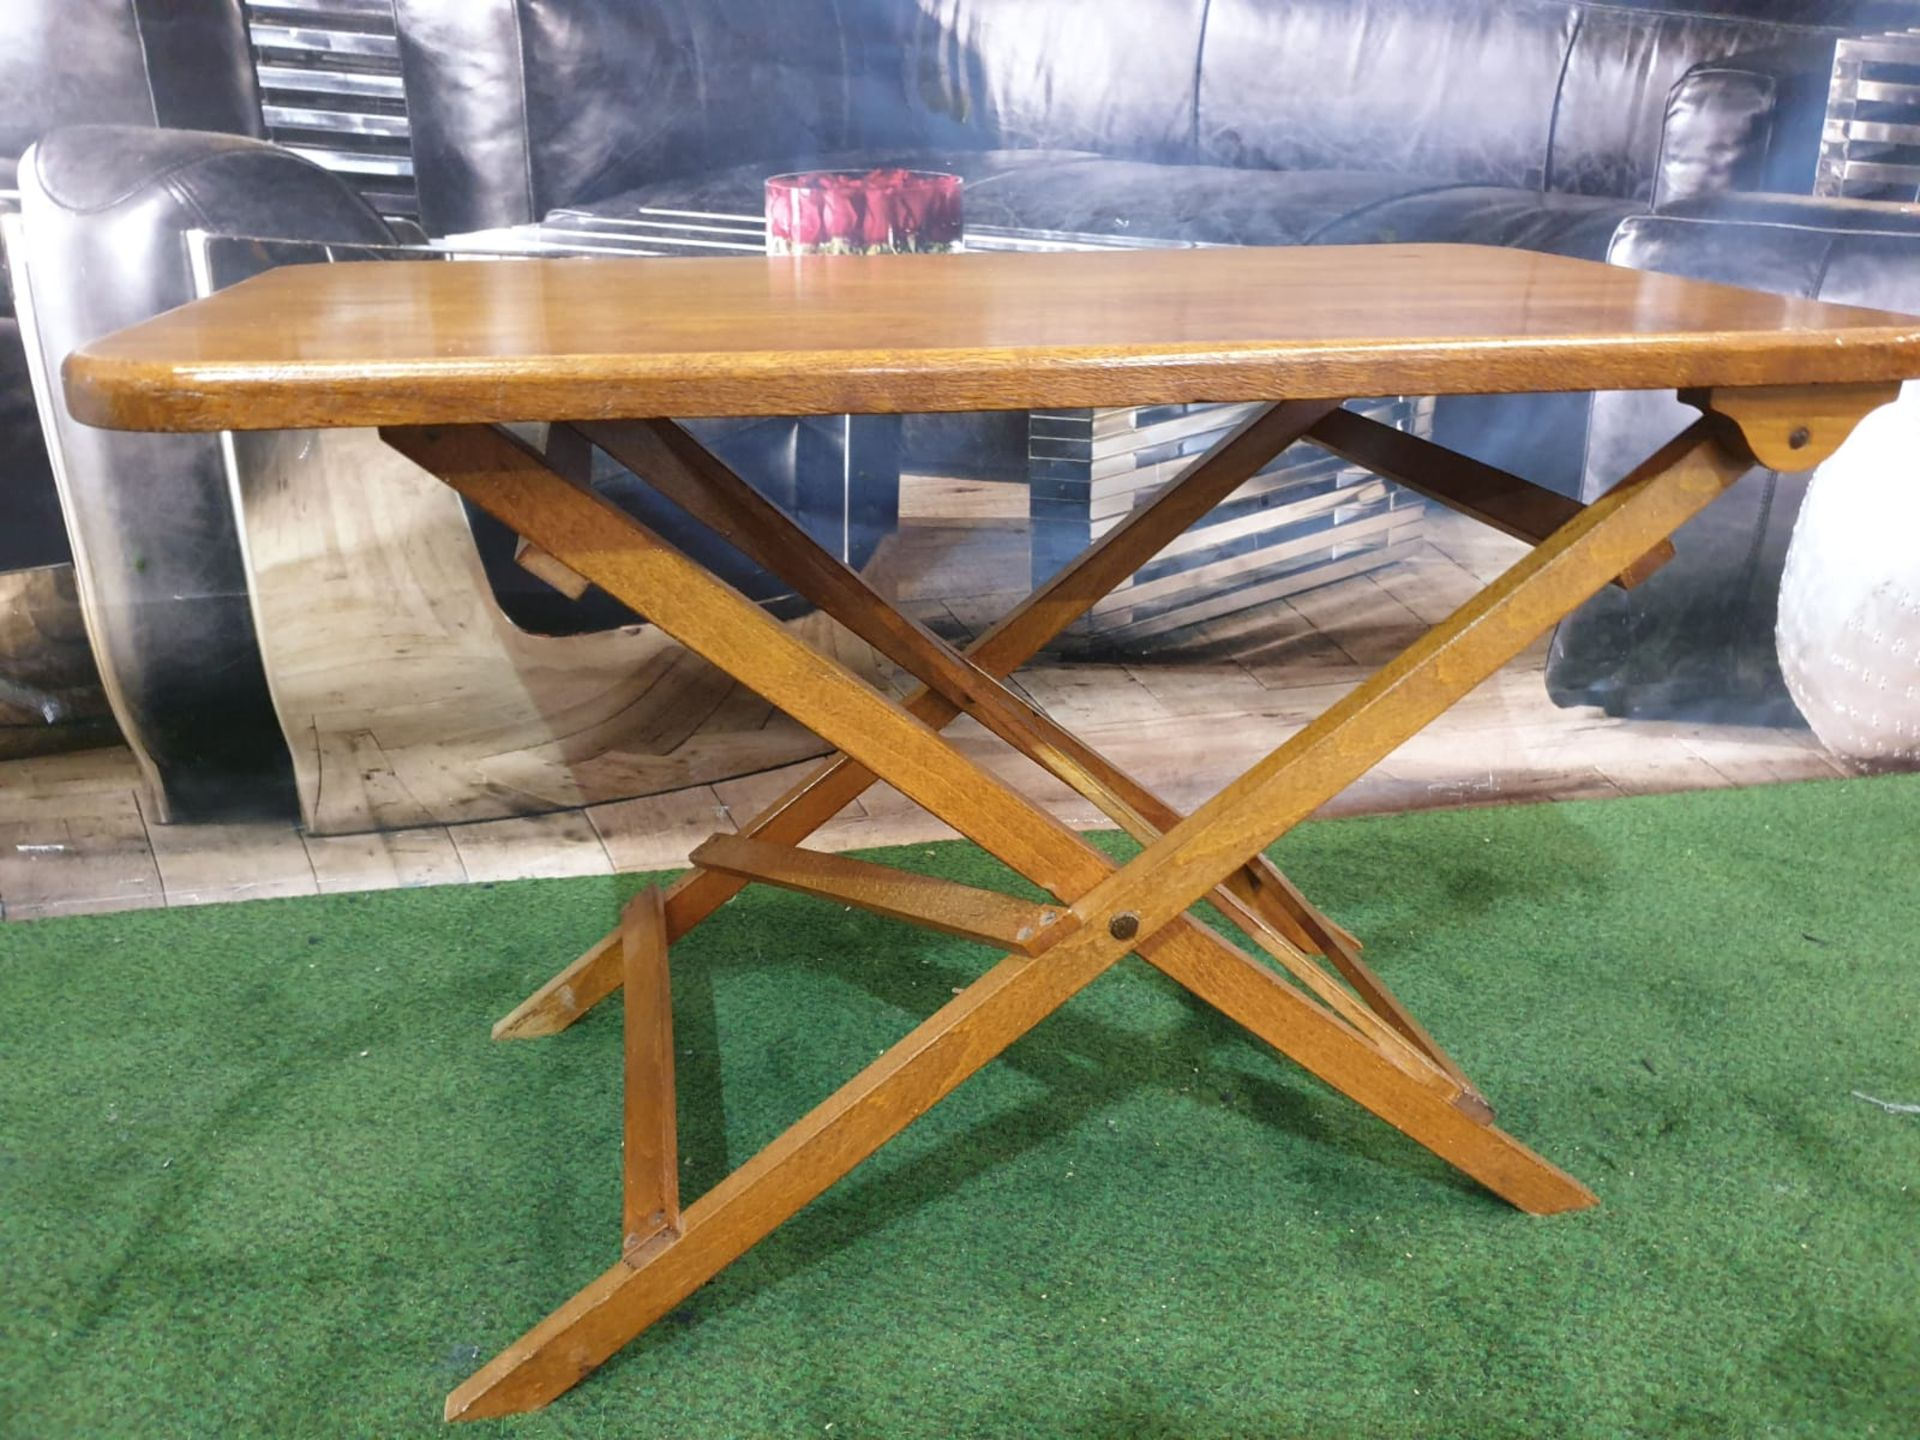 A polished teak folding table 71 x 40 x 4cm - Image 3 of 5